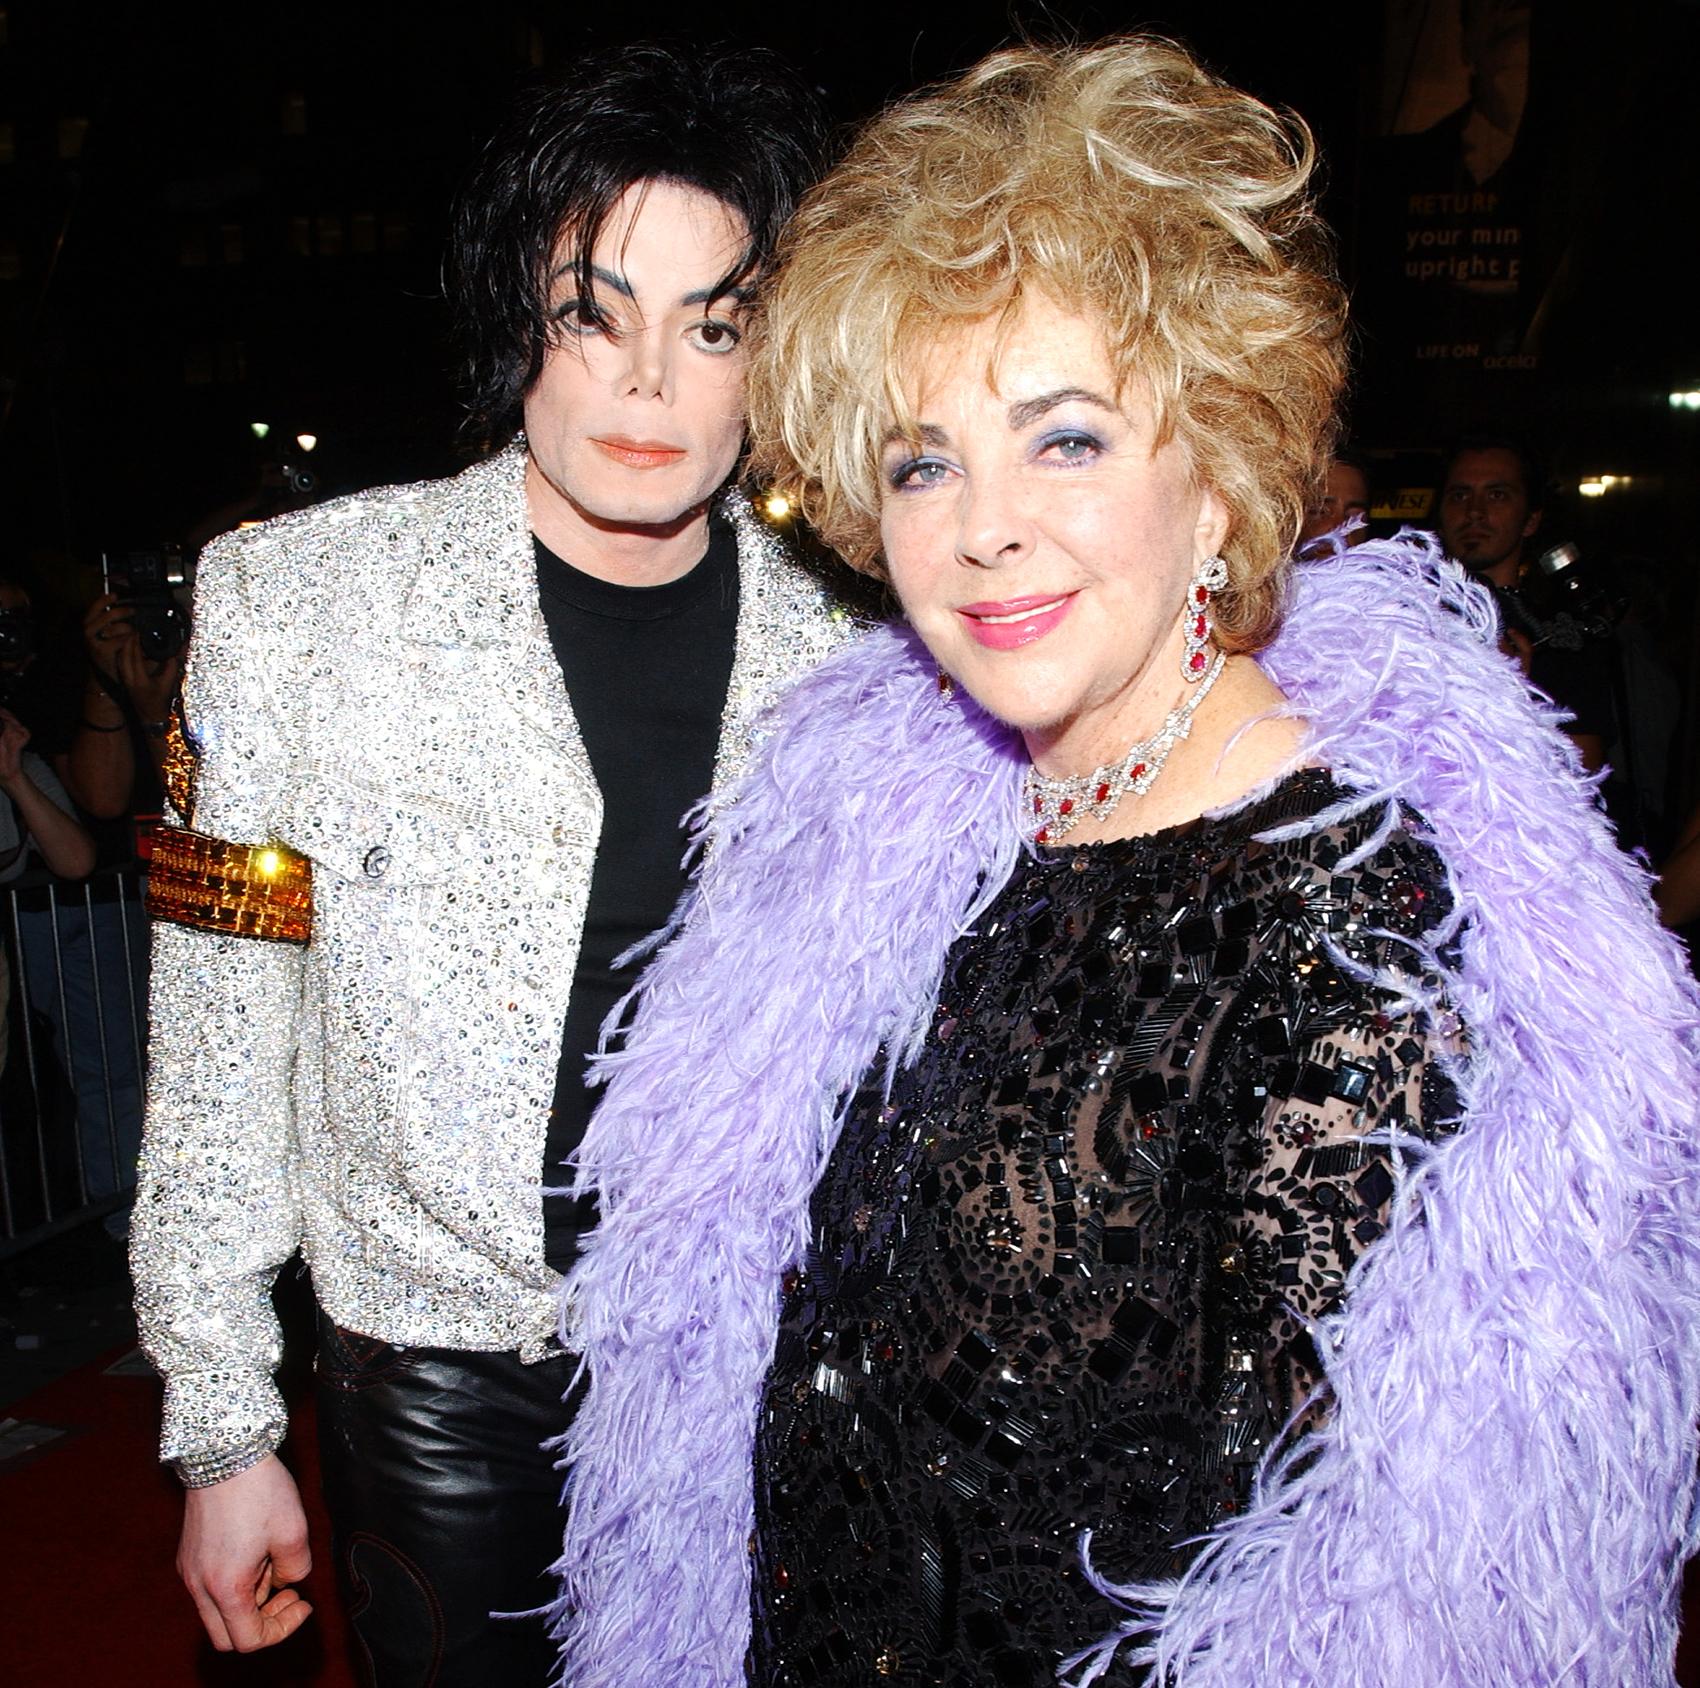 Michael Jackson and Elizabeth Taylor